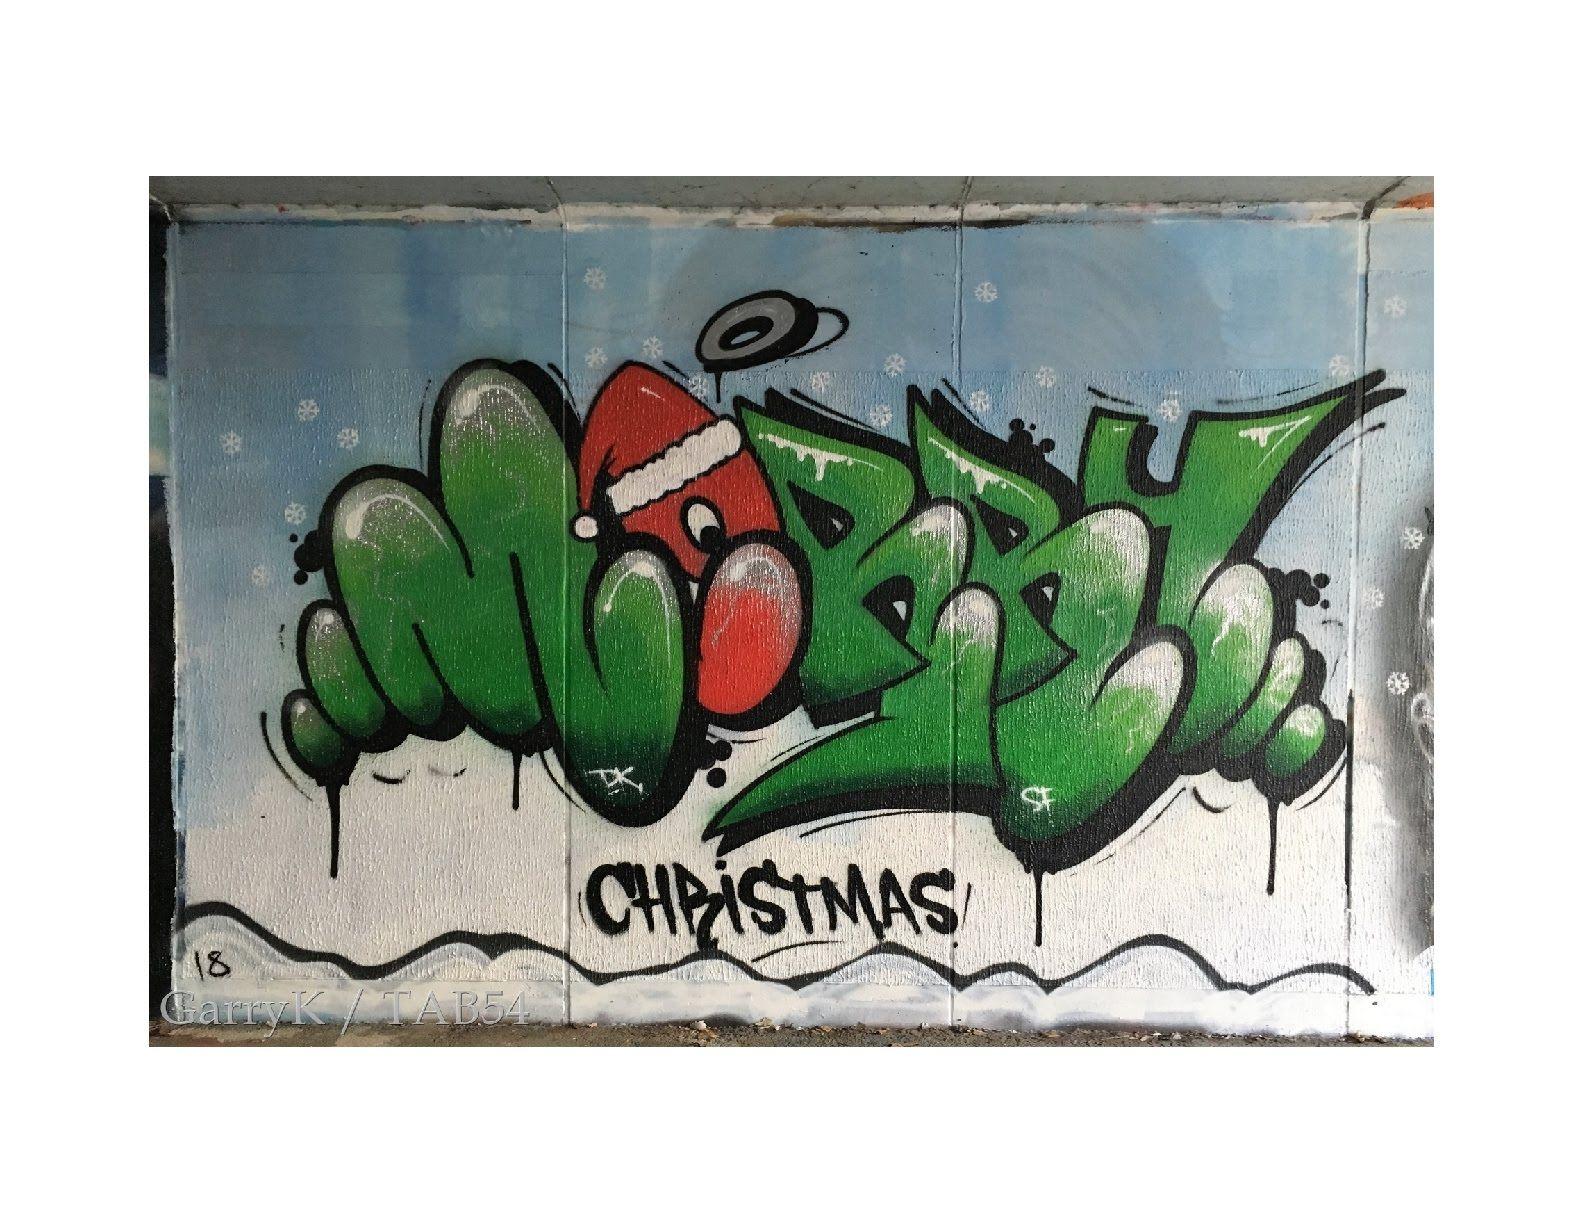 Christmas Graffiti Background.Street Art By Decay 37 Christmas 2018 Merry Christmas